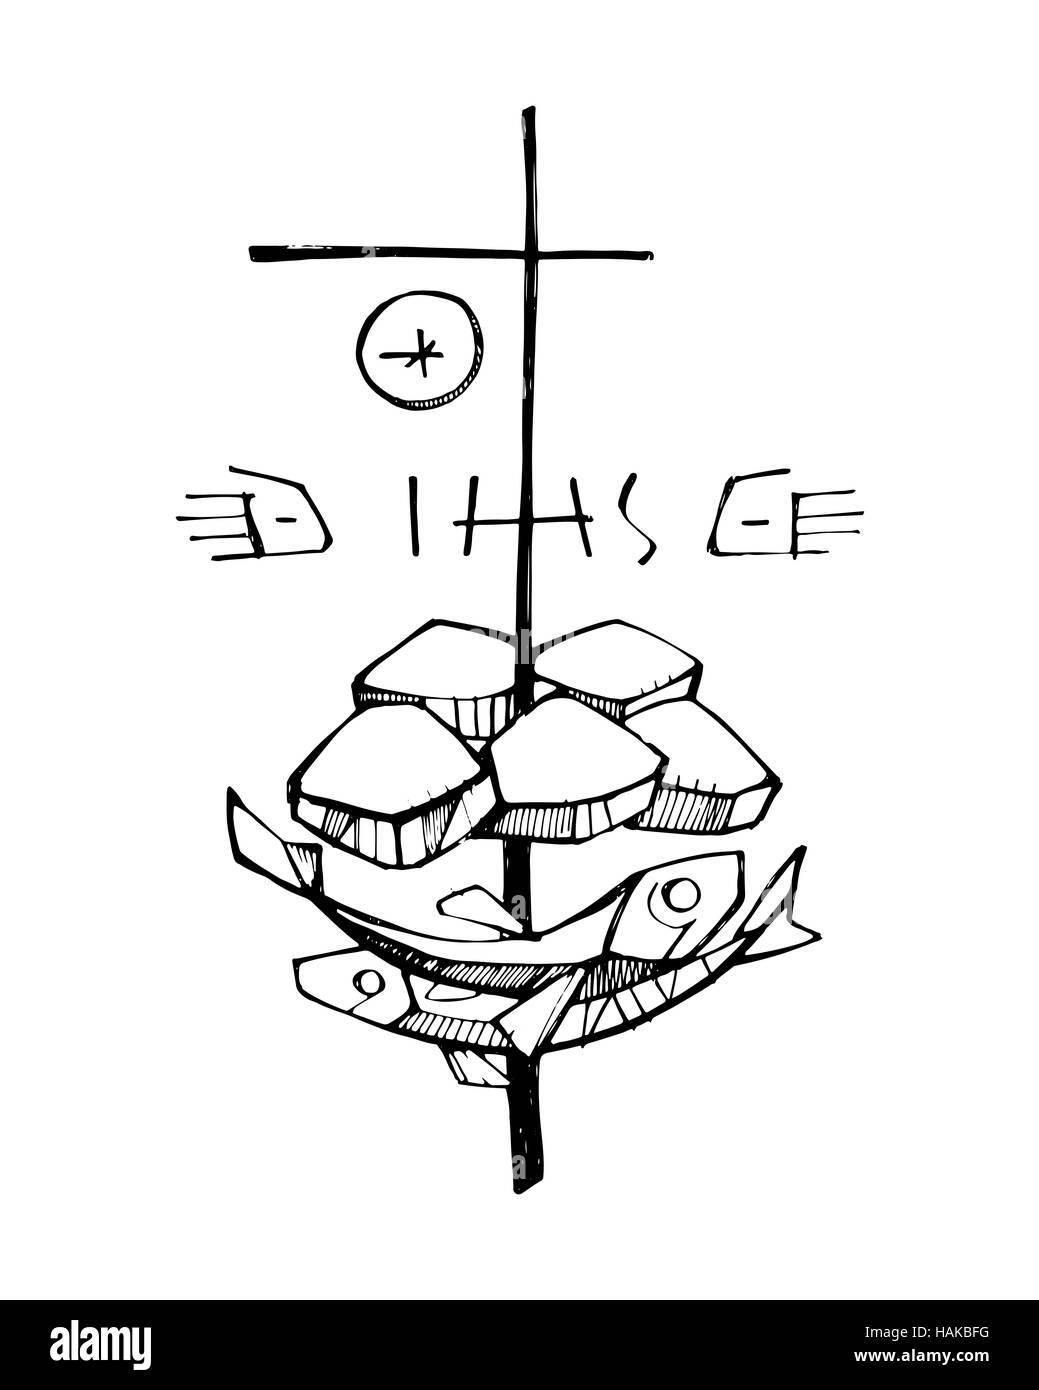 Ihs Religion Symbols Christian Stock Photos Ihs Religion Symbols